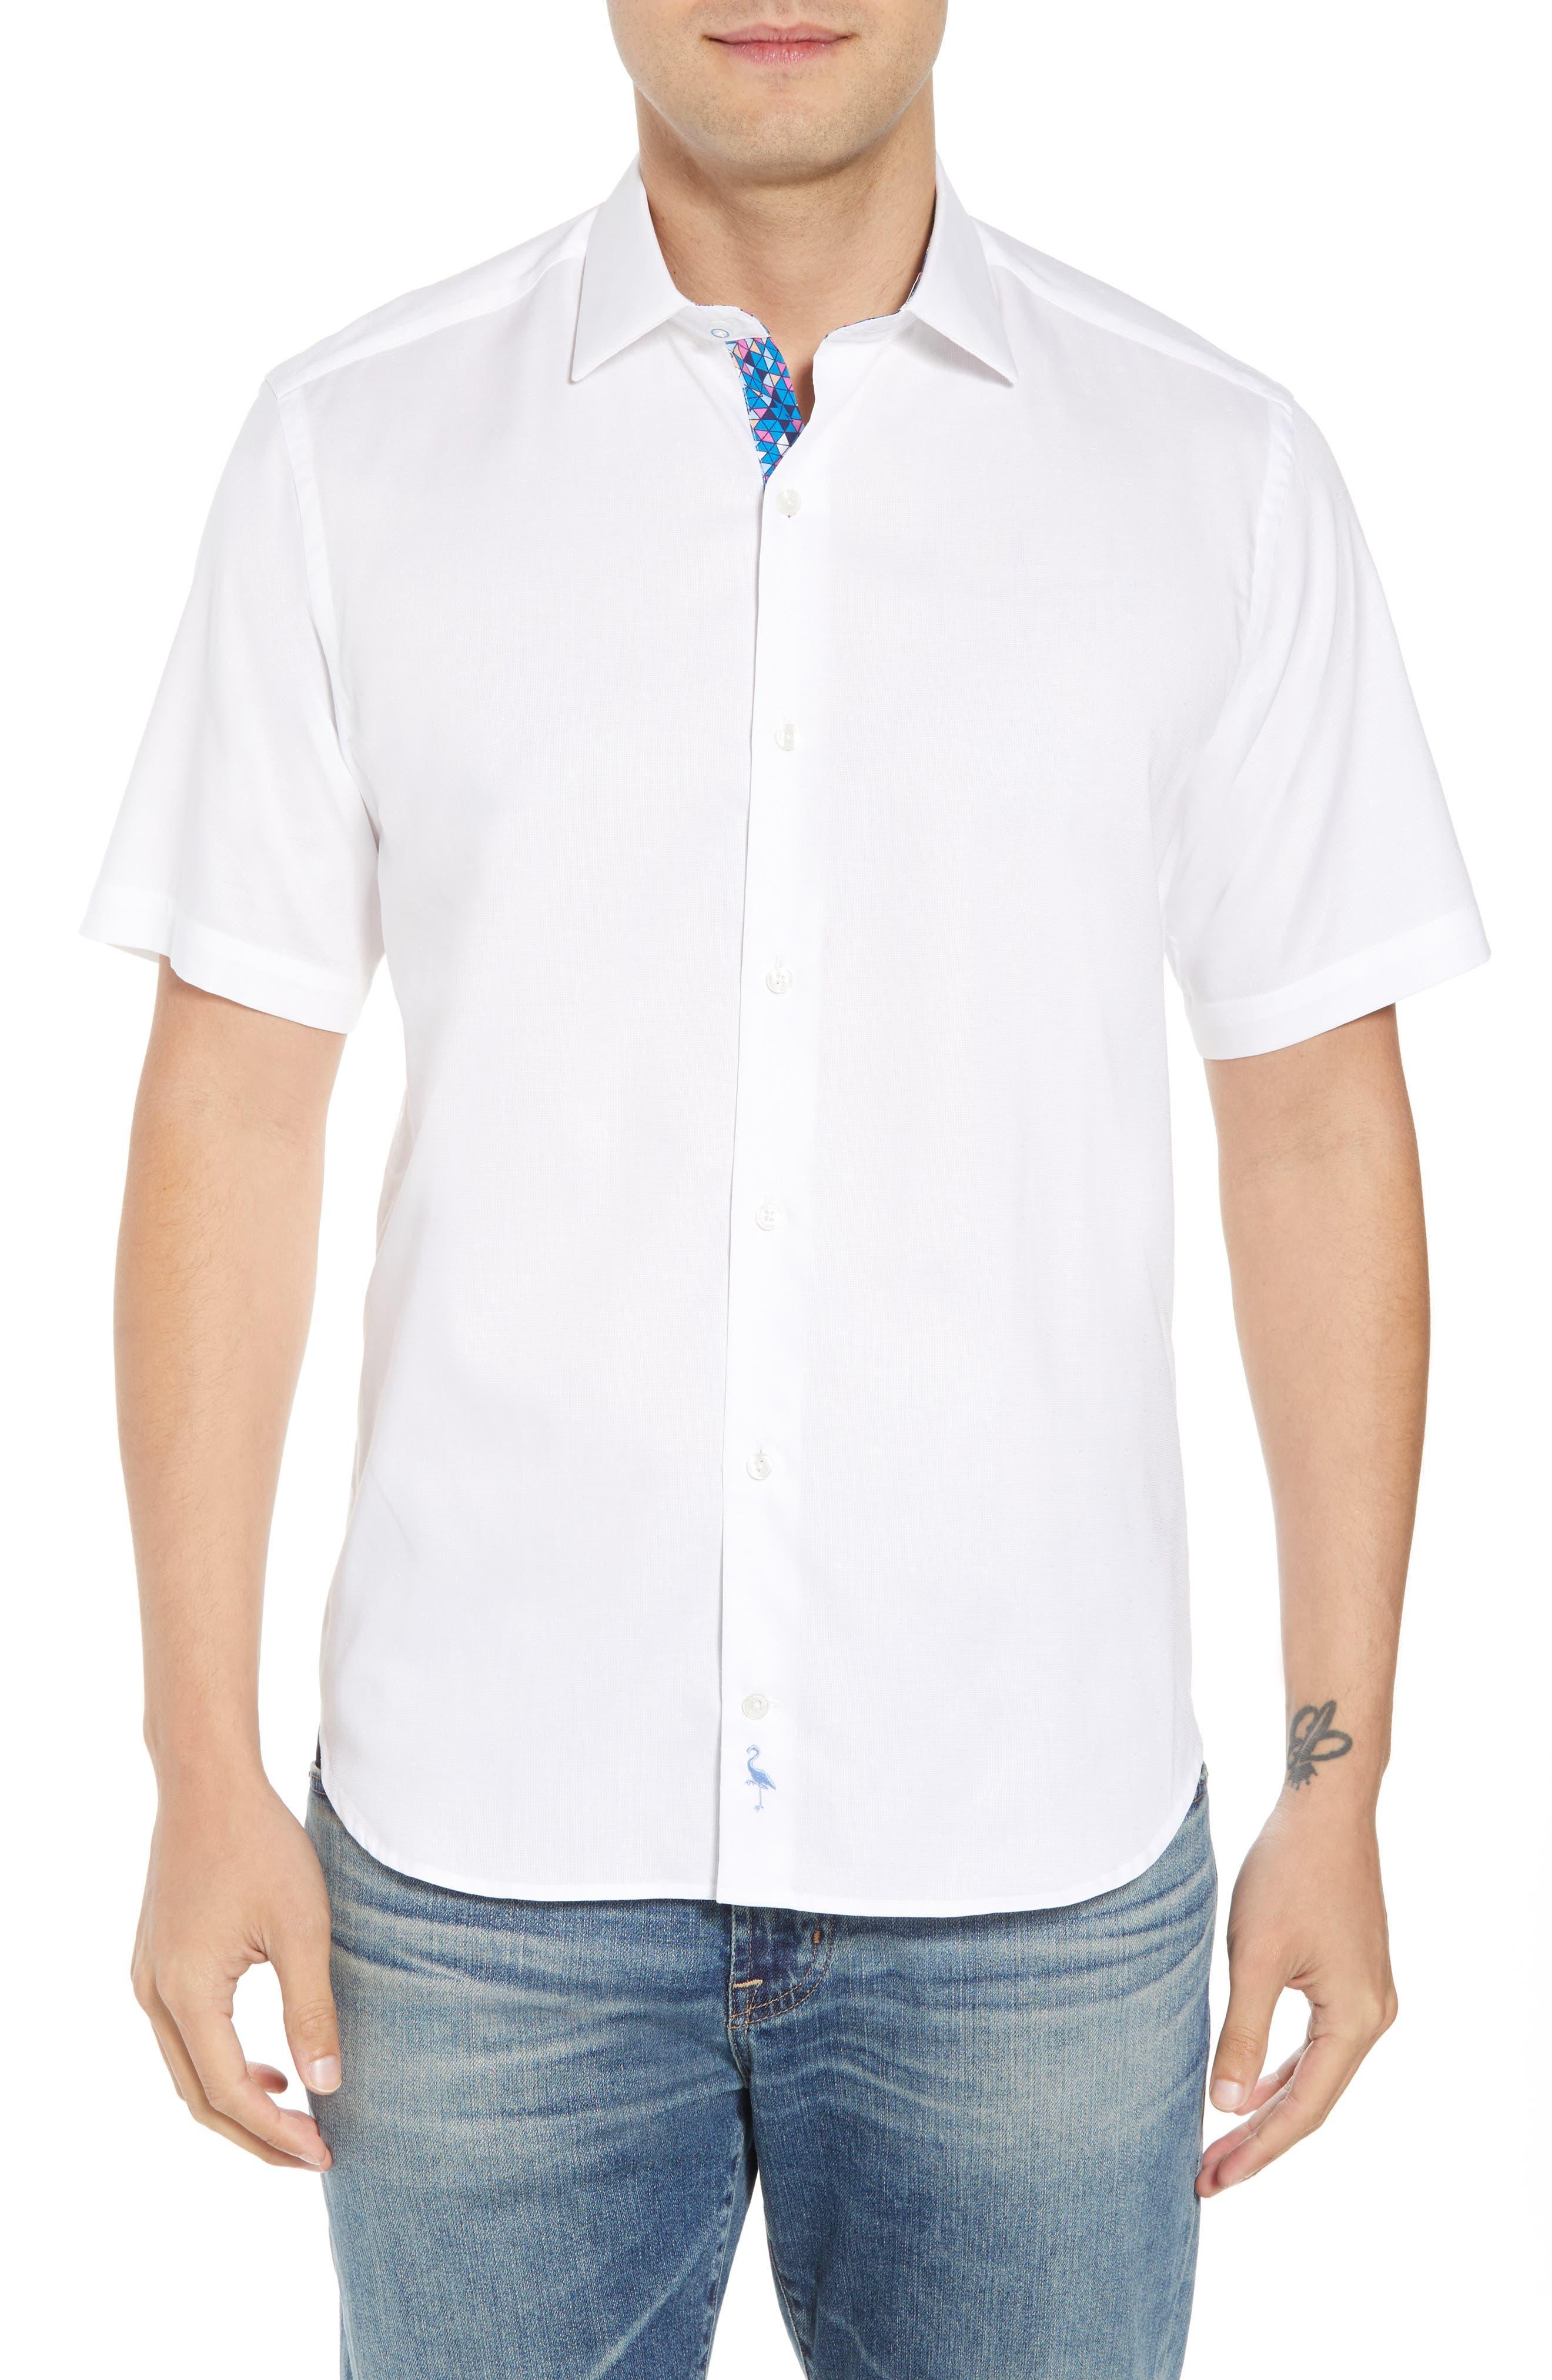 Arlen Regular Fit Sport Shirt,                         Main,                         color, White